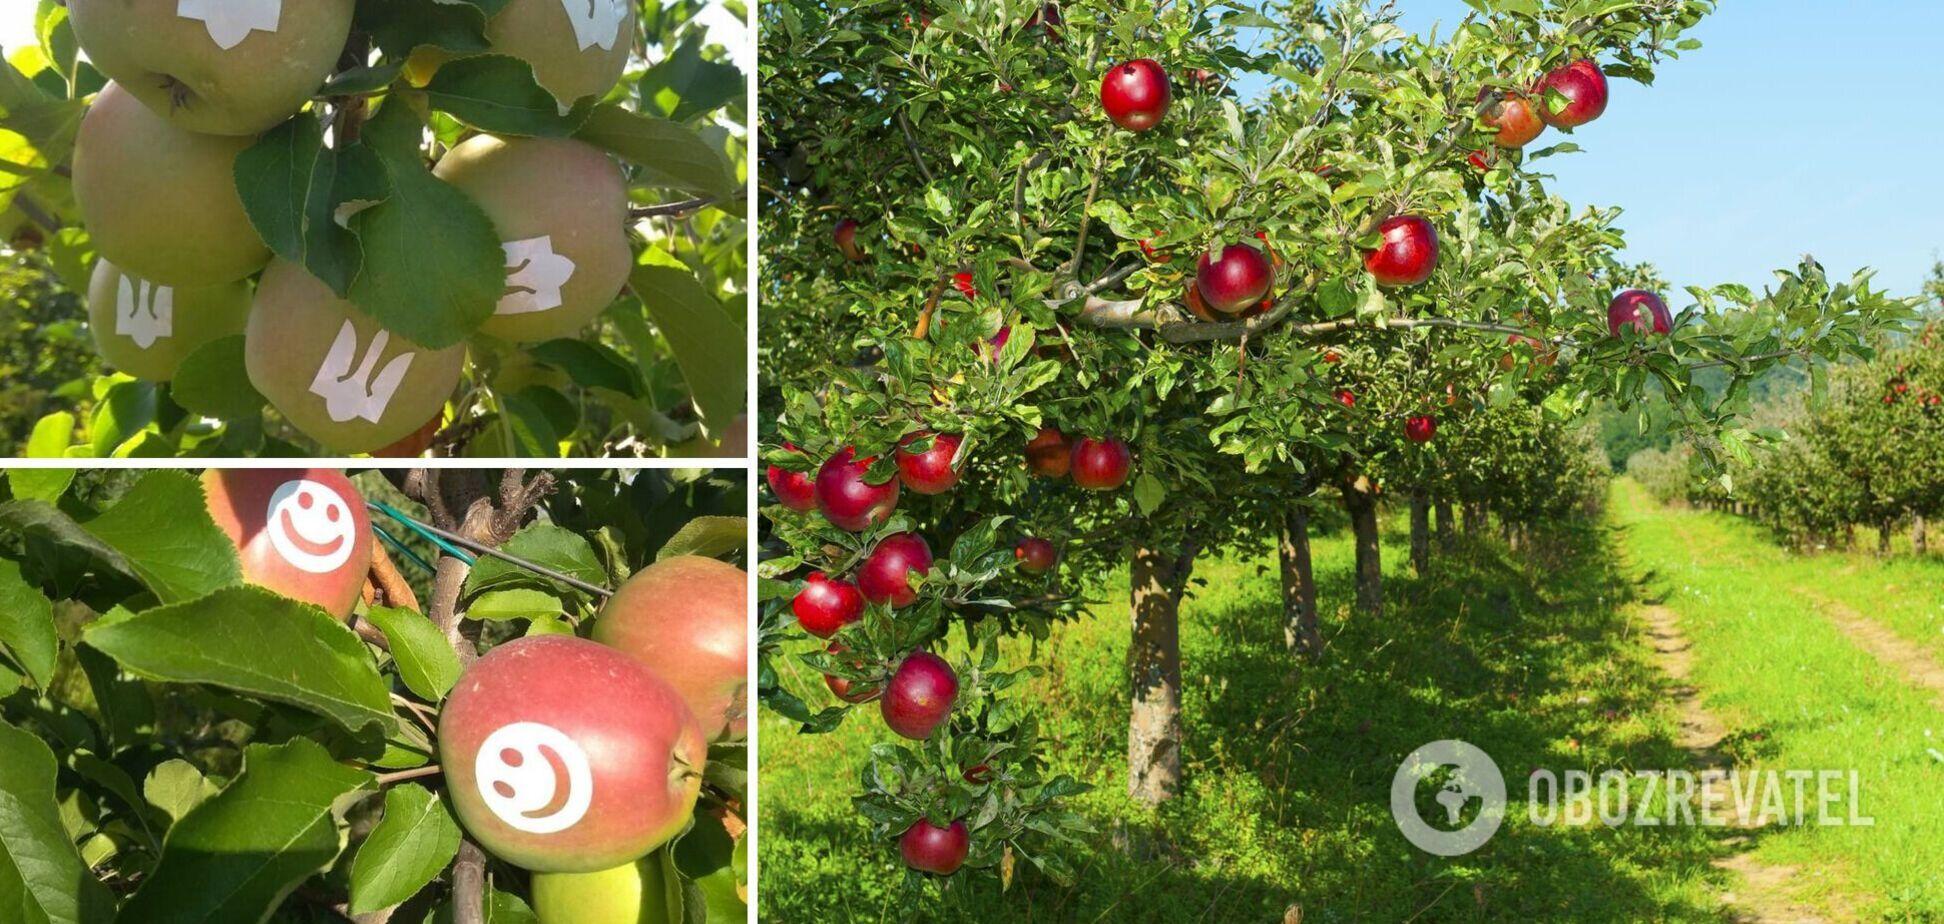 Яблоки с трезубцем